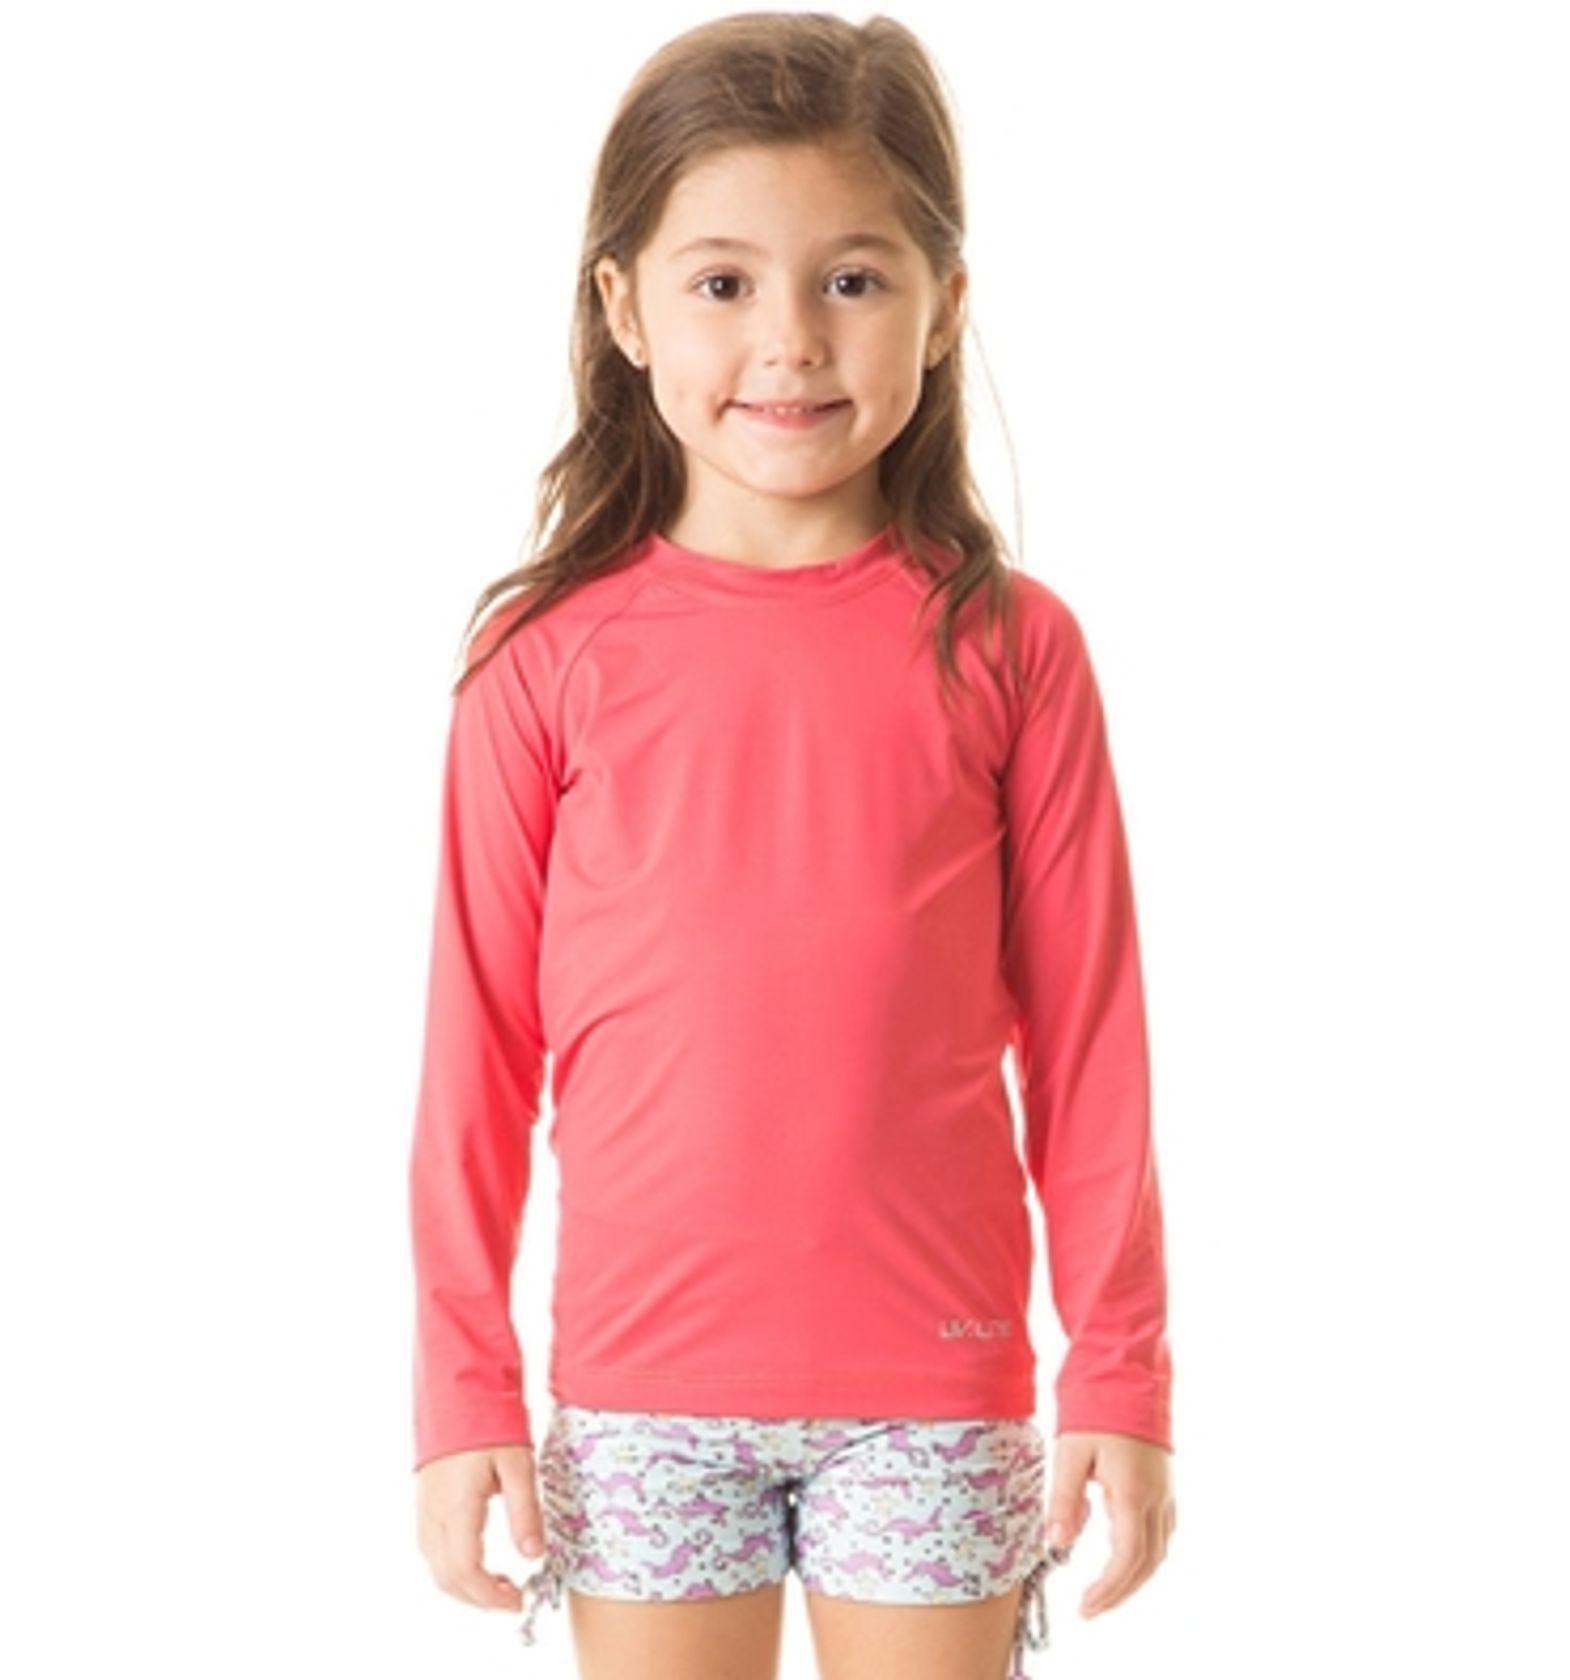 UV LINE Camiseta Uvpro Manga Longa Infantil Rosa Gloss Proteção Solar